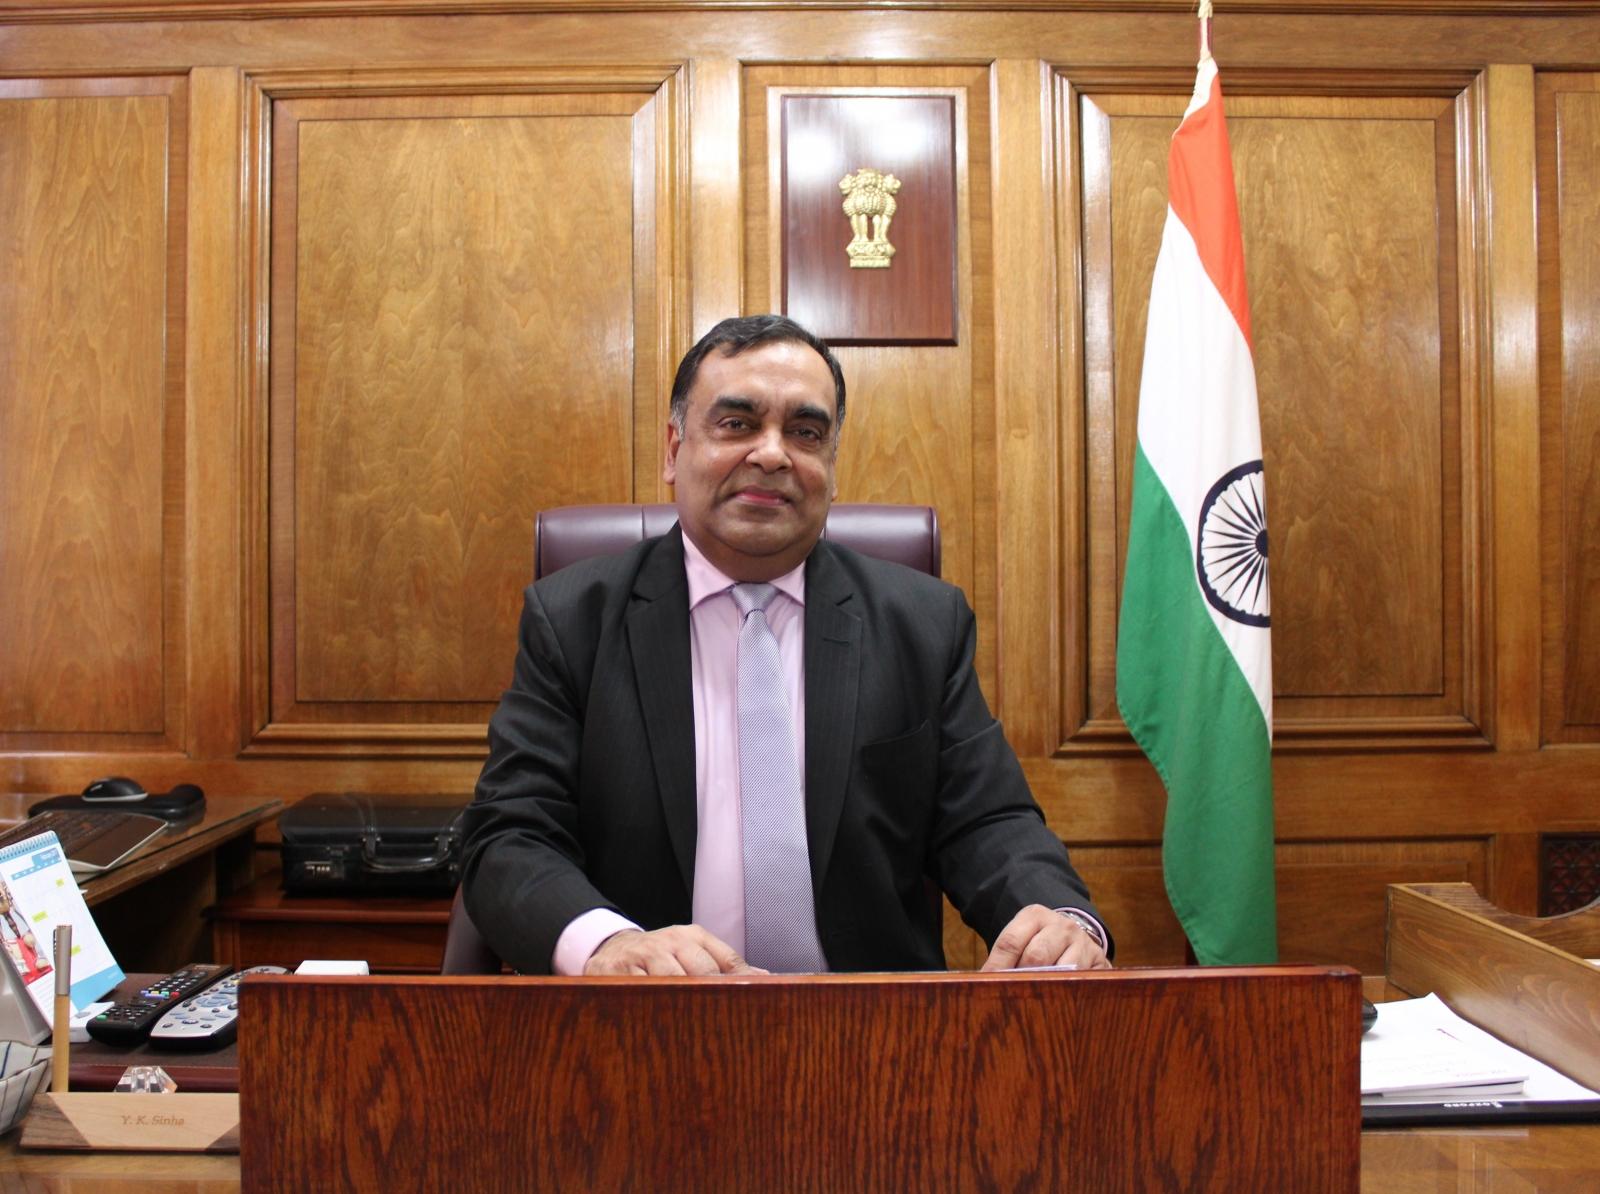 Yashvardhan Kumar Sinha II